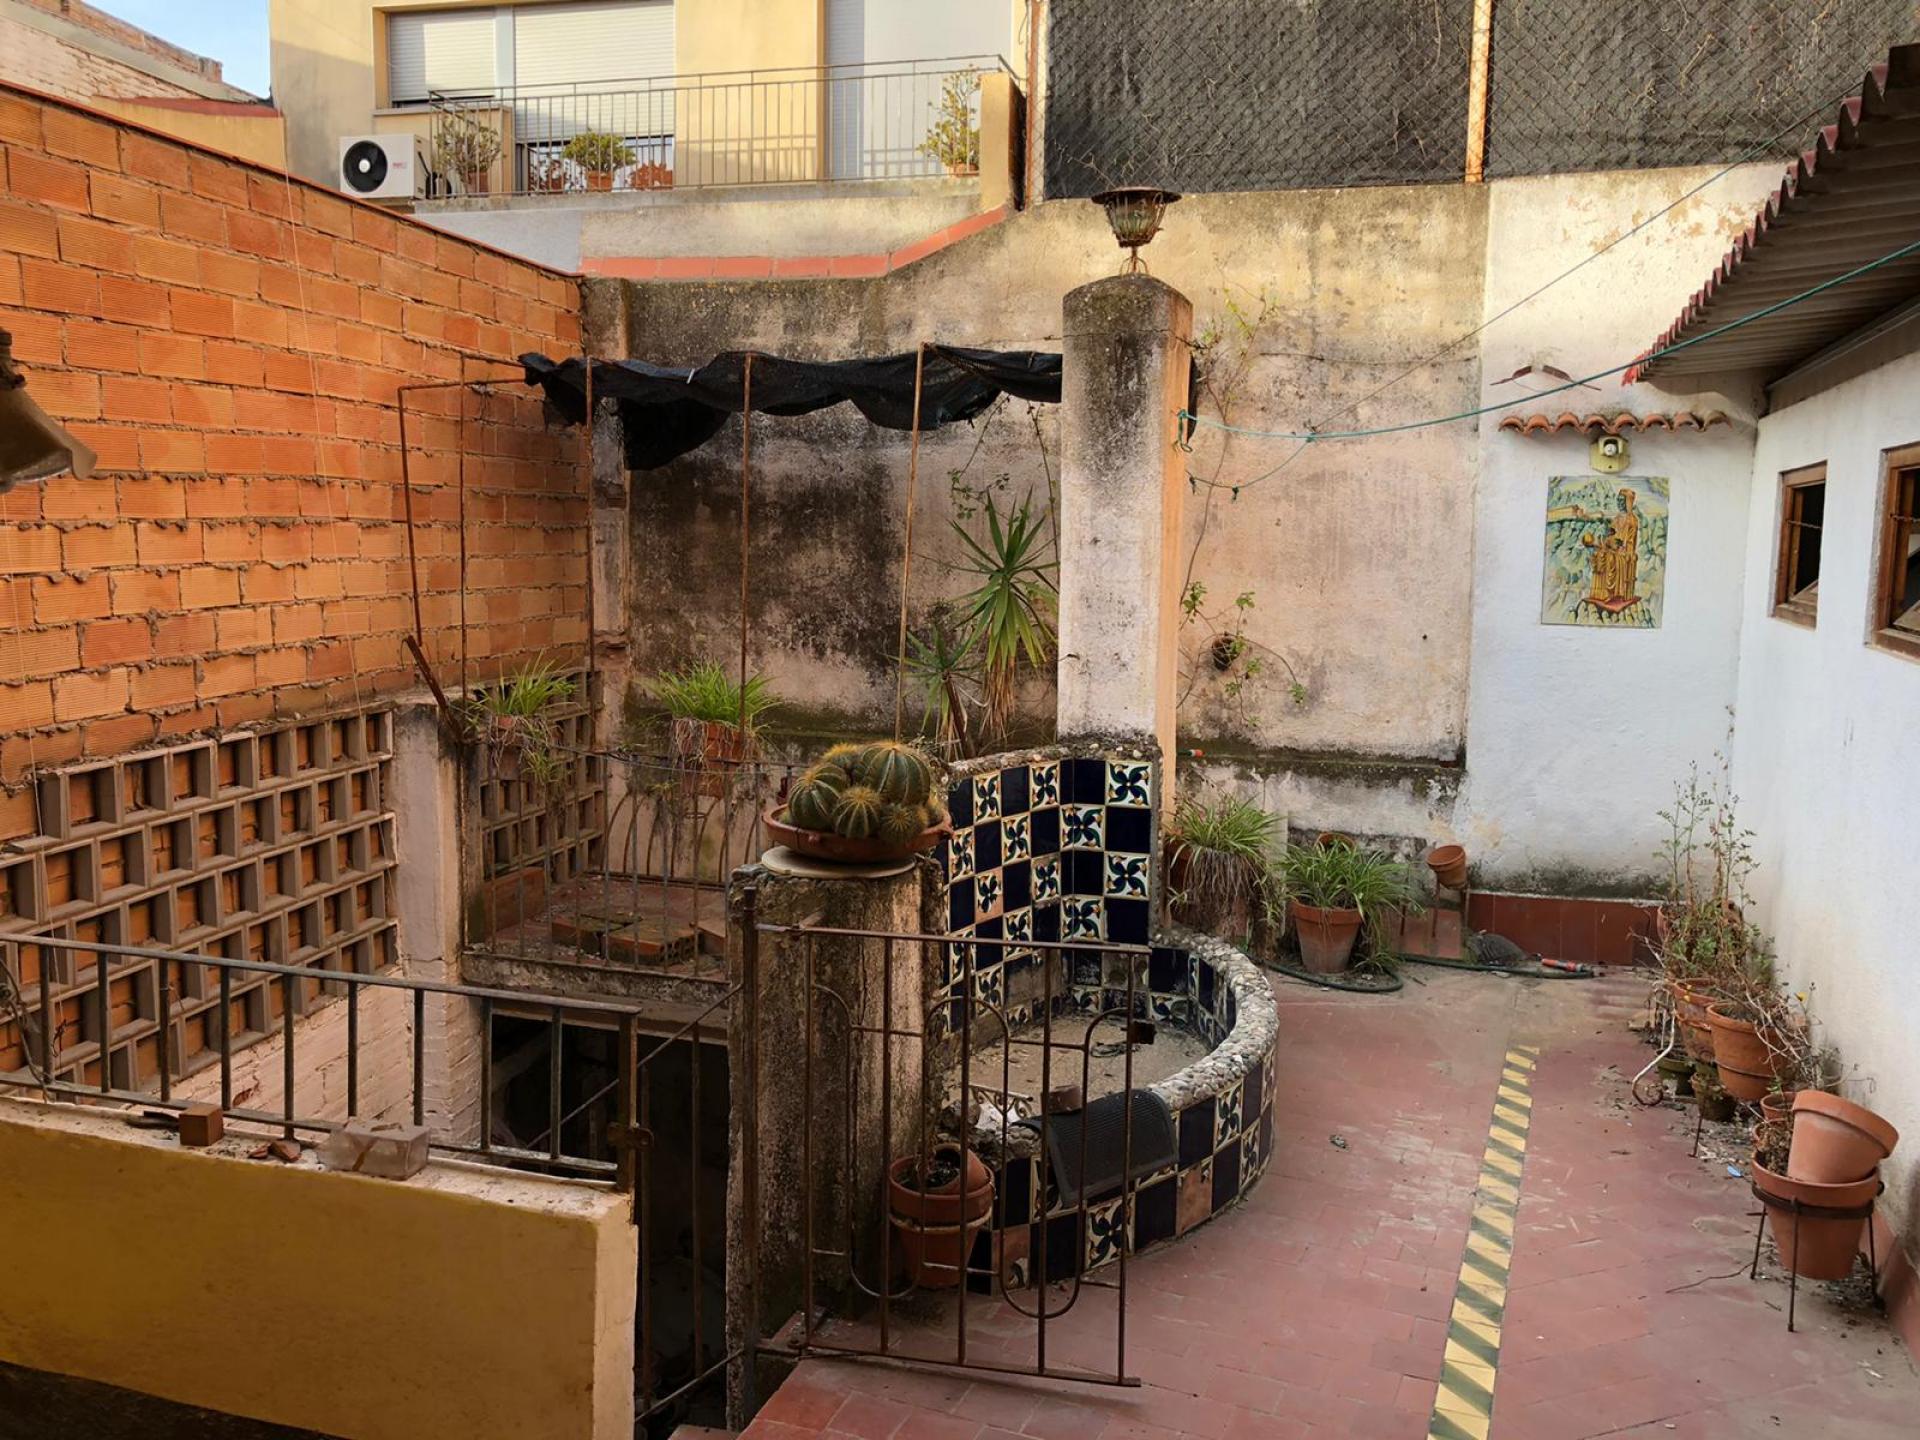 Foto 20 (V-727-2021) - Inmueble en  Venda a Sant Julià, Calle oriol , 15, Vilafranca del Penedès